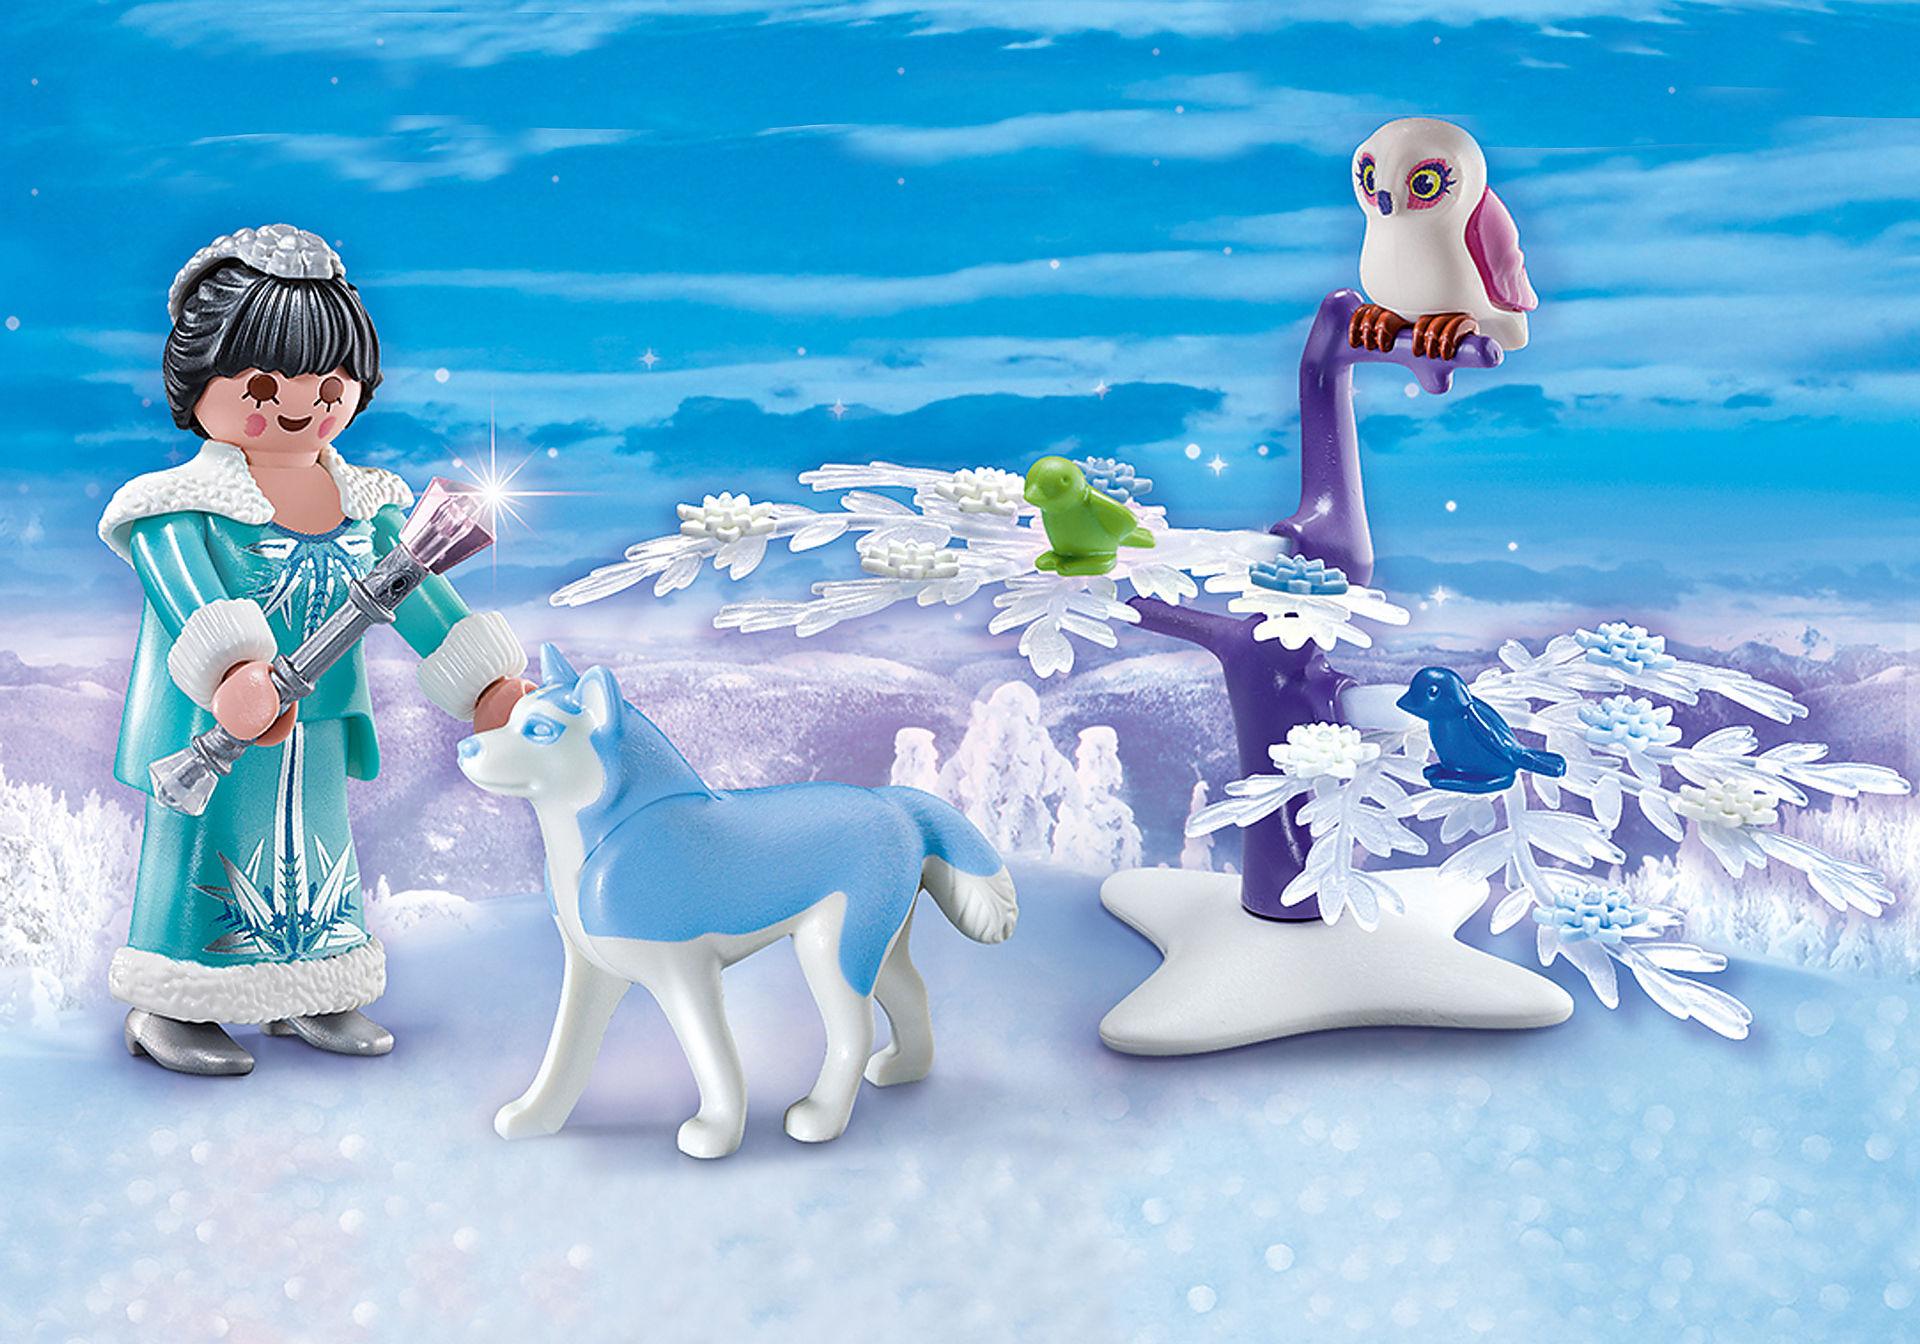 70311 Ice Princess Carry Case zoom image1